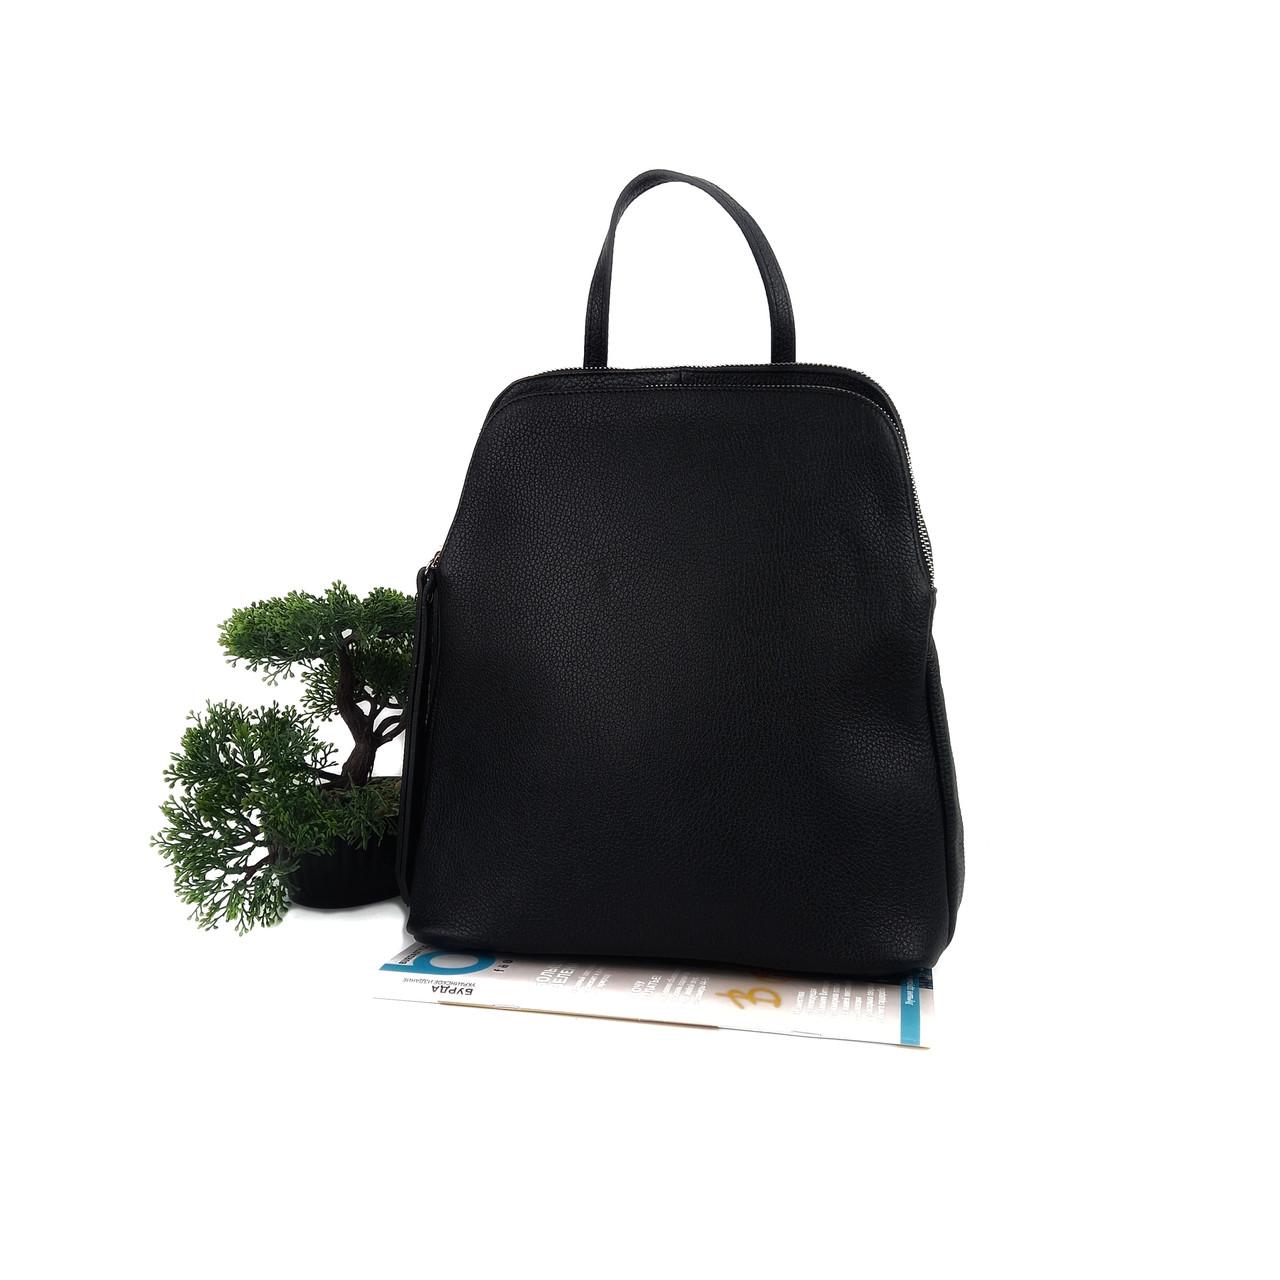 Модный женский рюкзак кожа черный Арт.02402 (VC) V.P. Італія